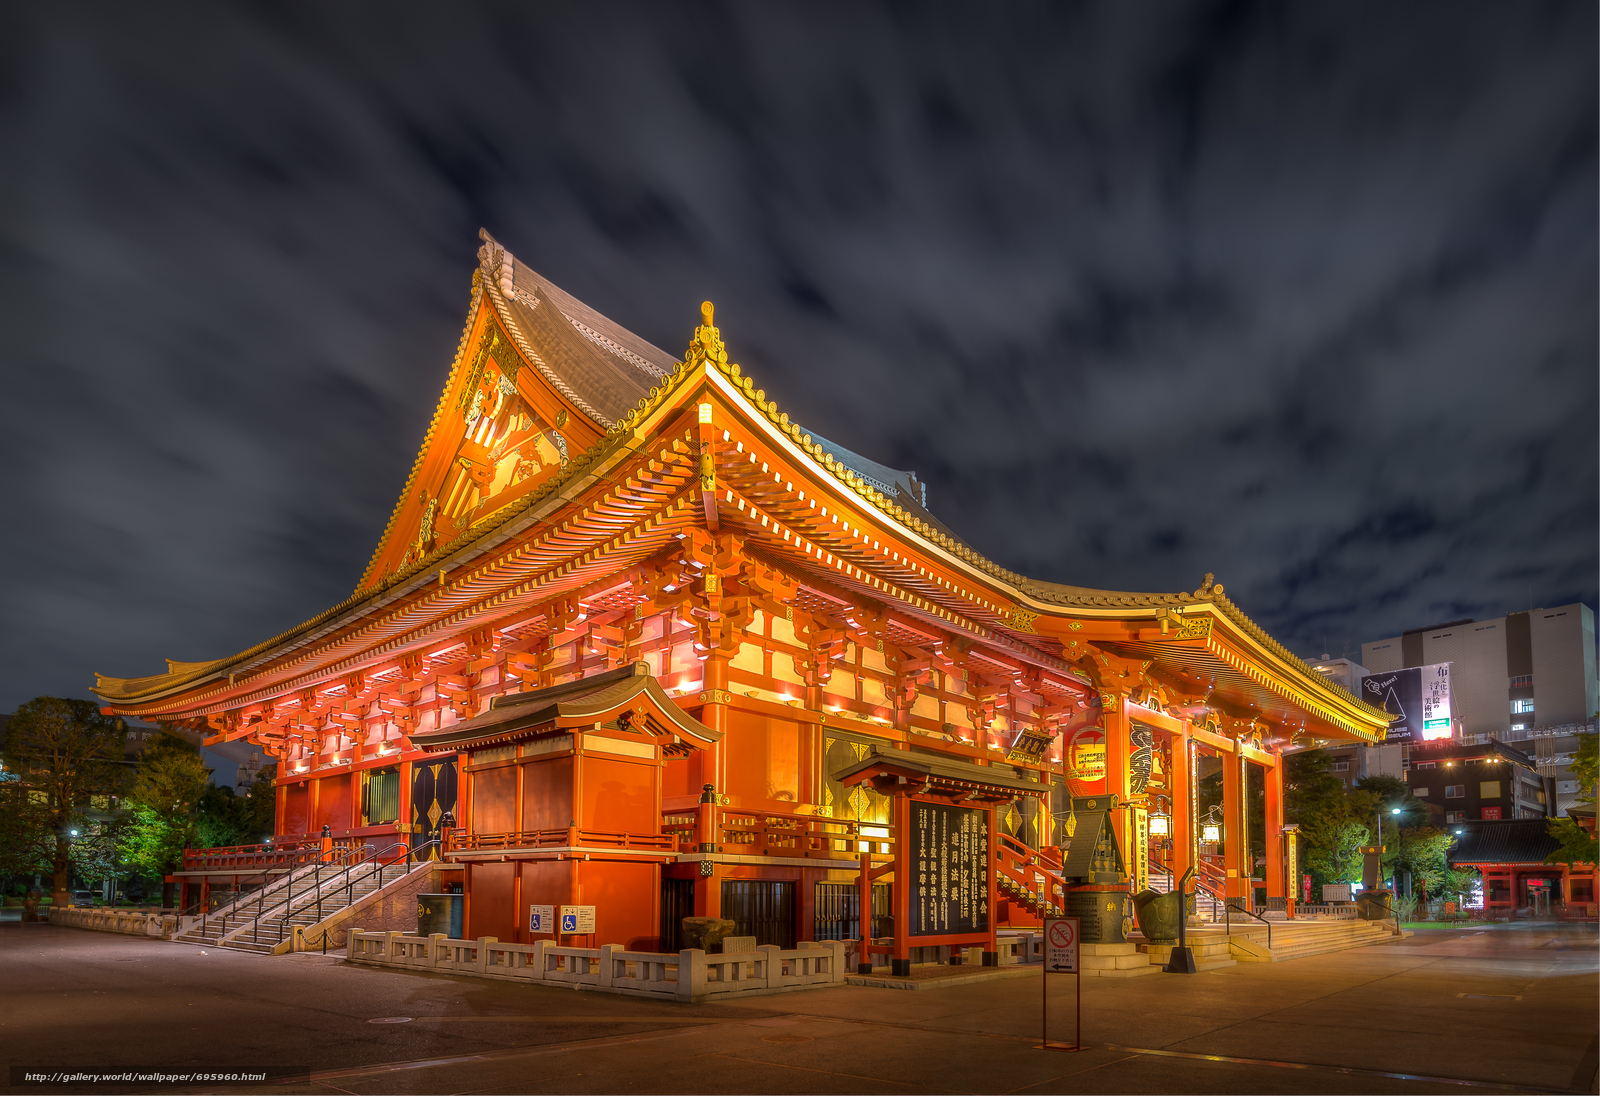 Tokyo, Japan, Tokyo, japan, city, night, illuminations, panorama, Sensoji temple in Tokyo, Sensoji temple